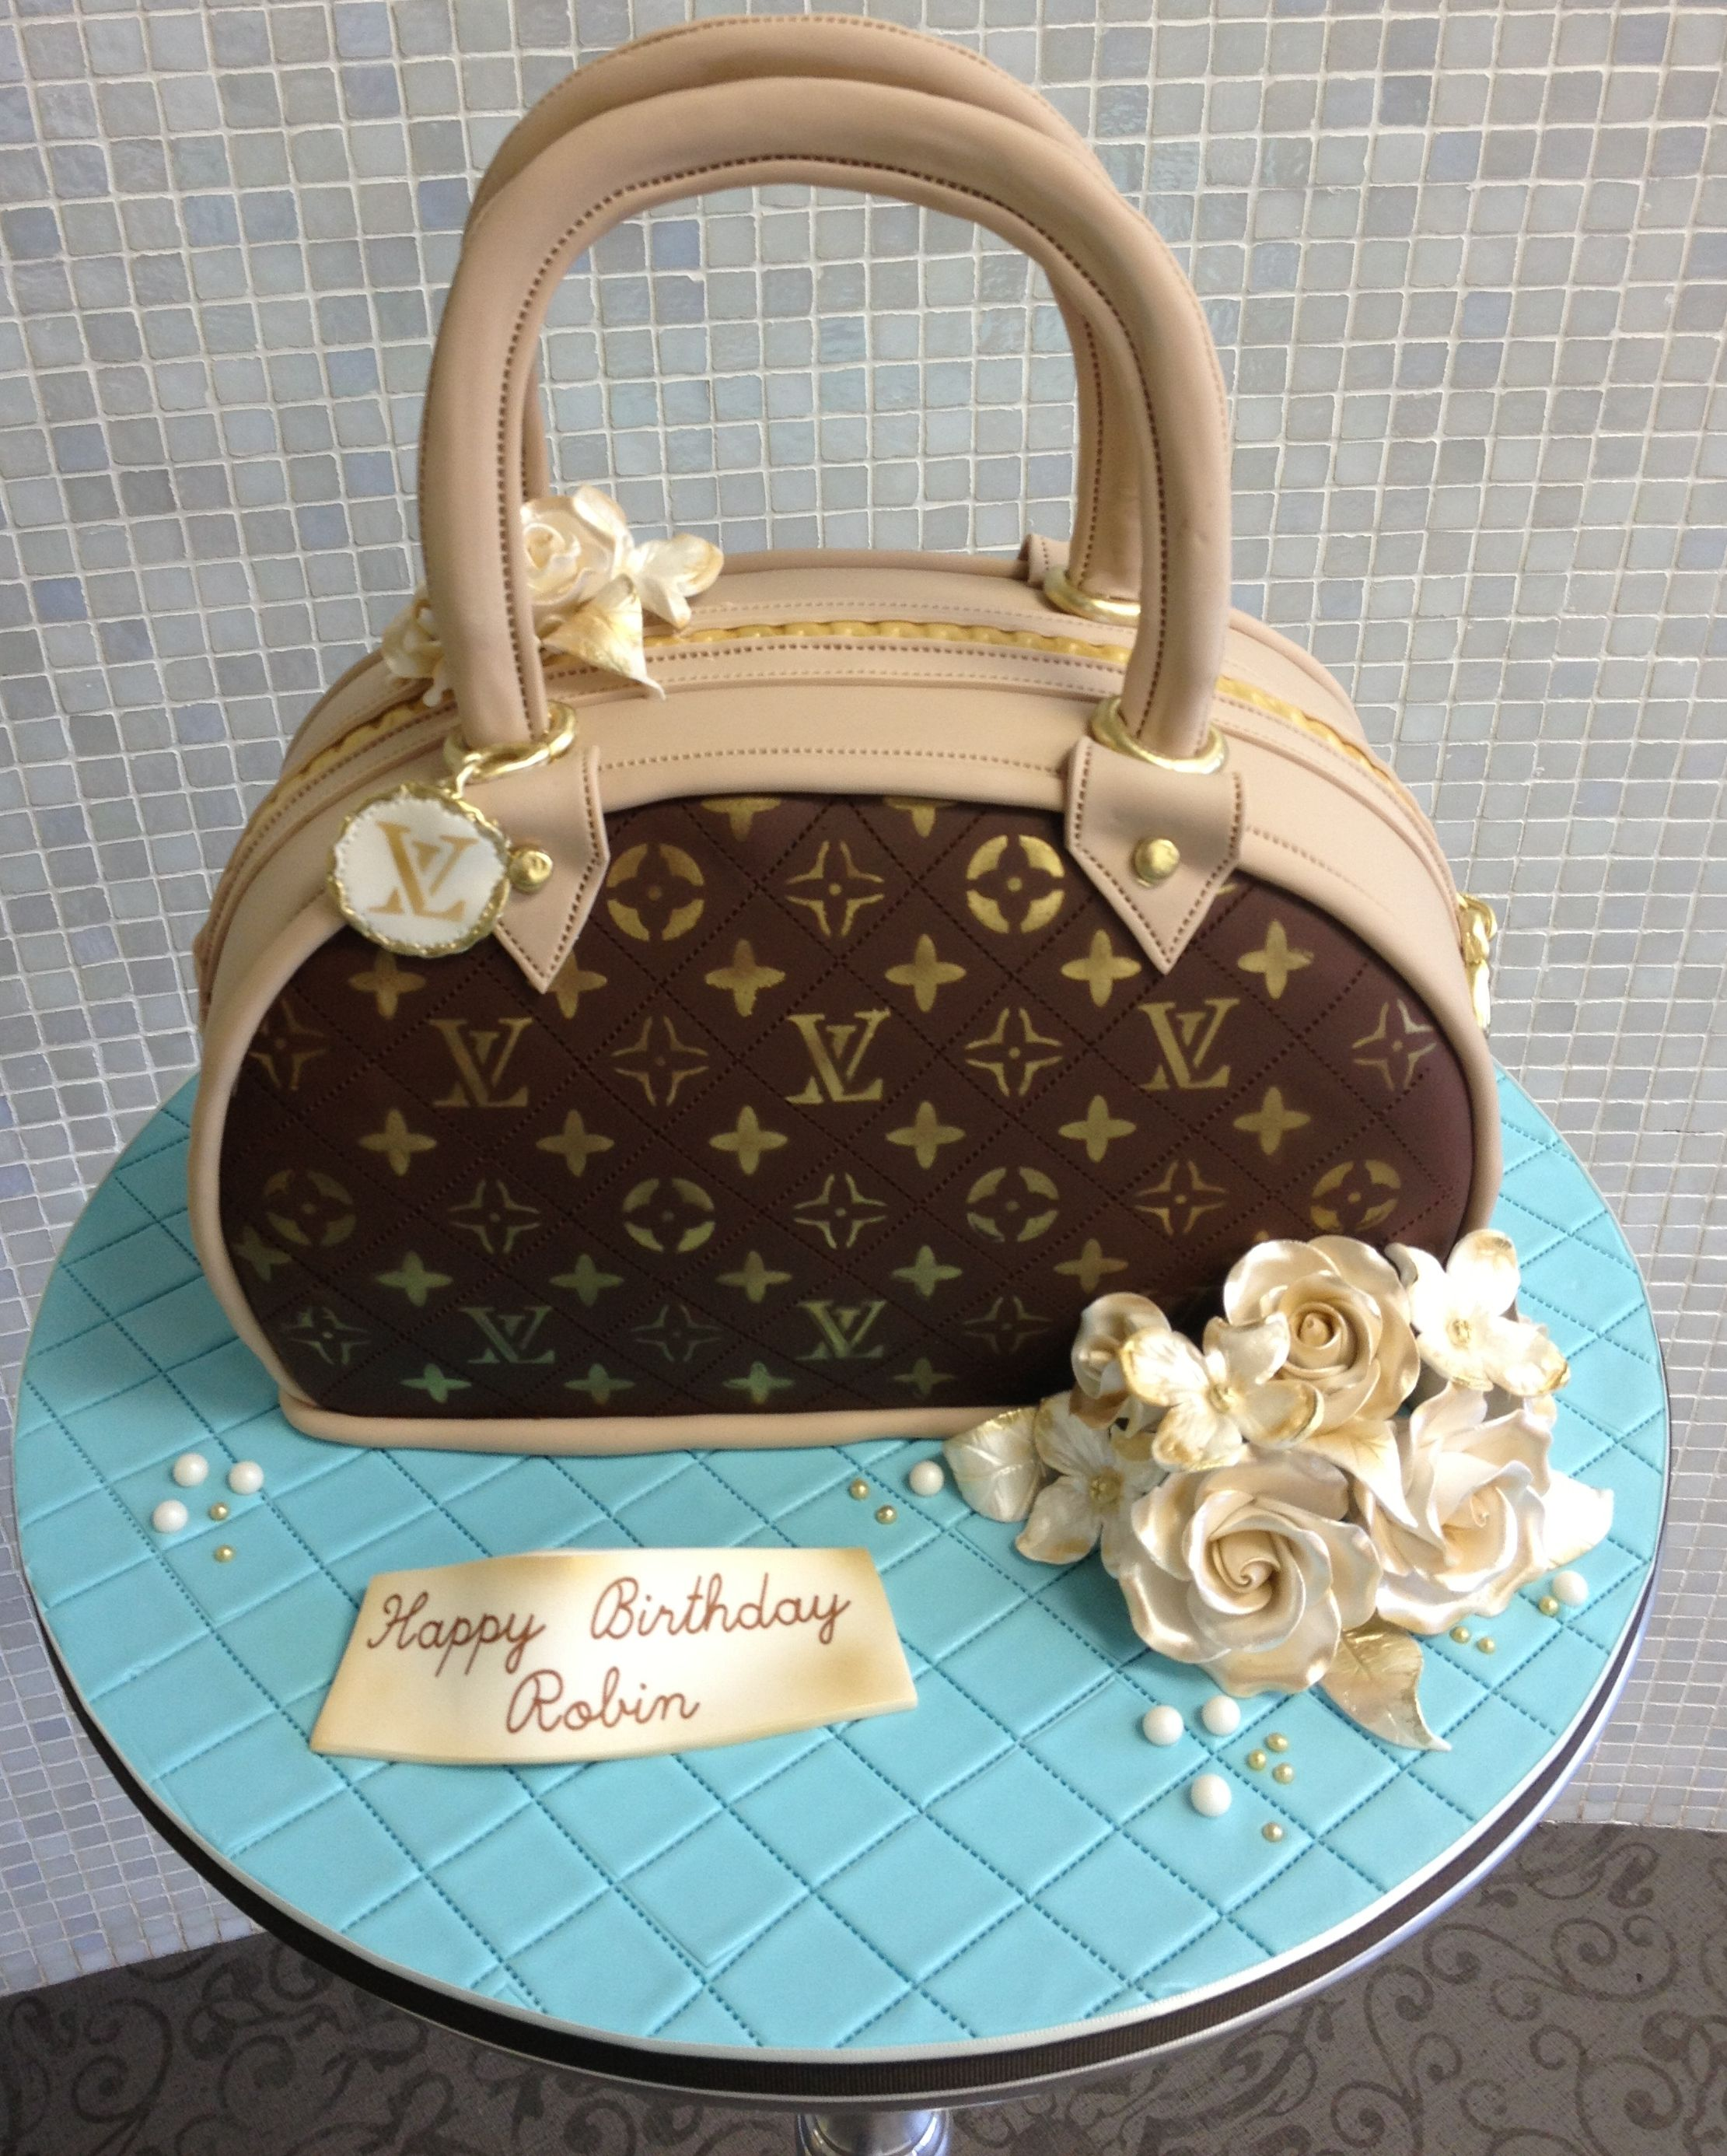 Superb Louis Vuitton Purse Cake Louis Vuitton Cake Handbag Cakes Personalised Birthday Cards Veneteletsinfo